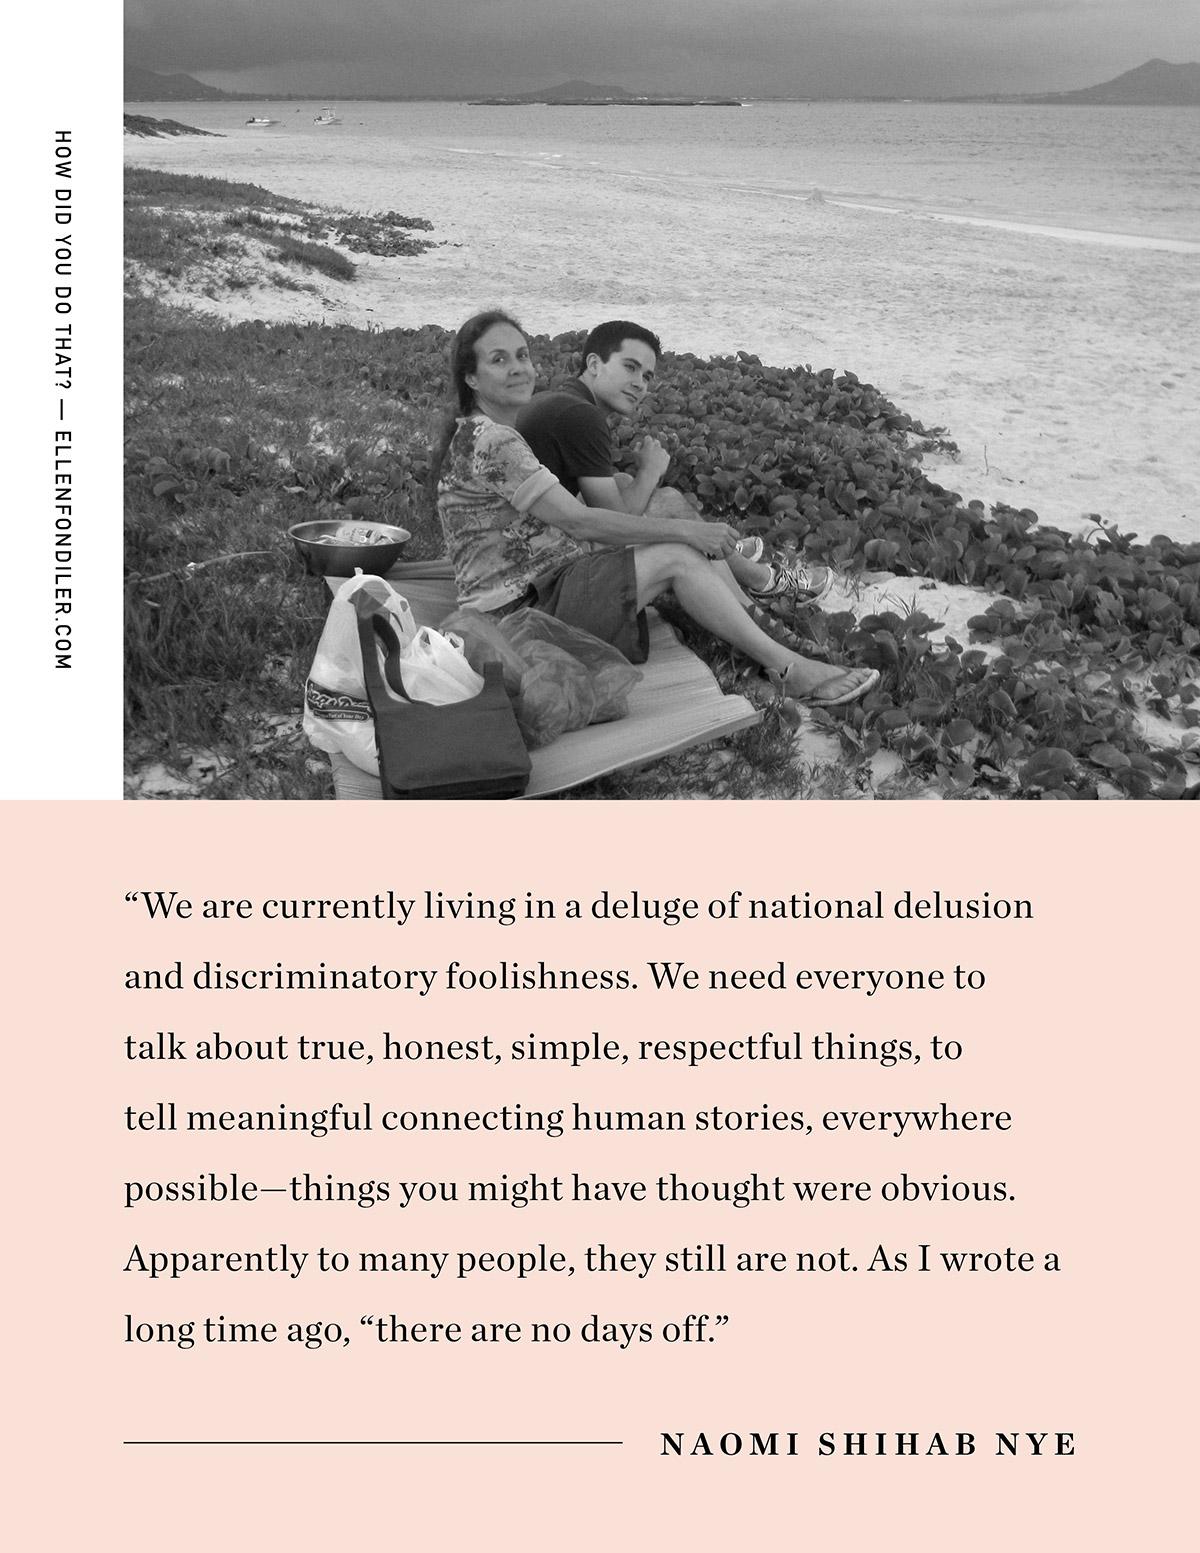 Ellen Fondiler | Naomi Shihab Nye